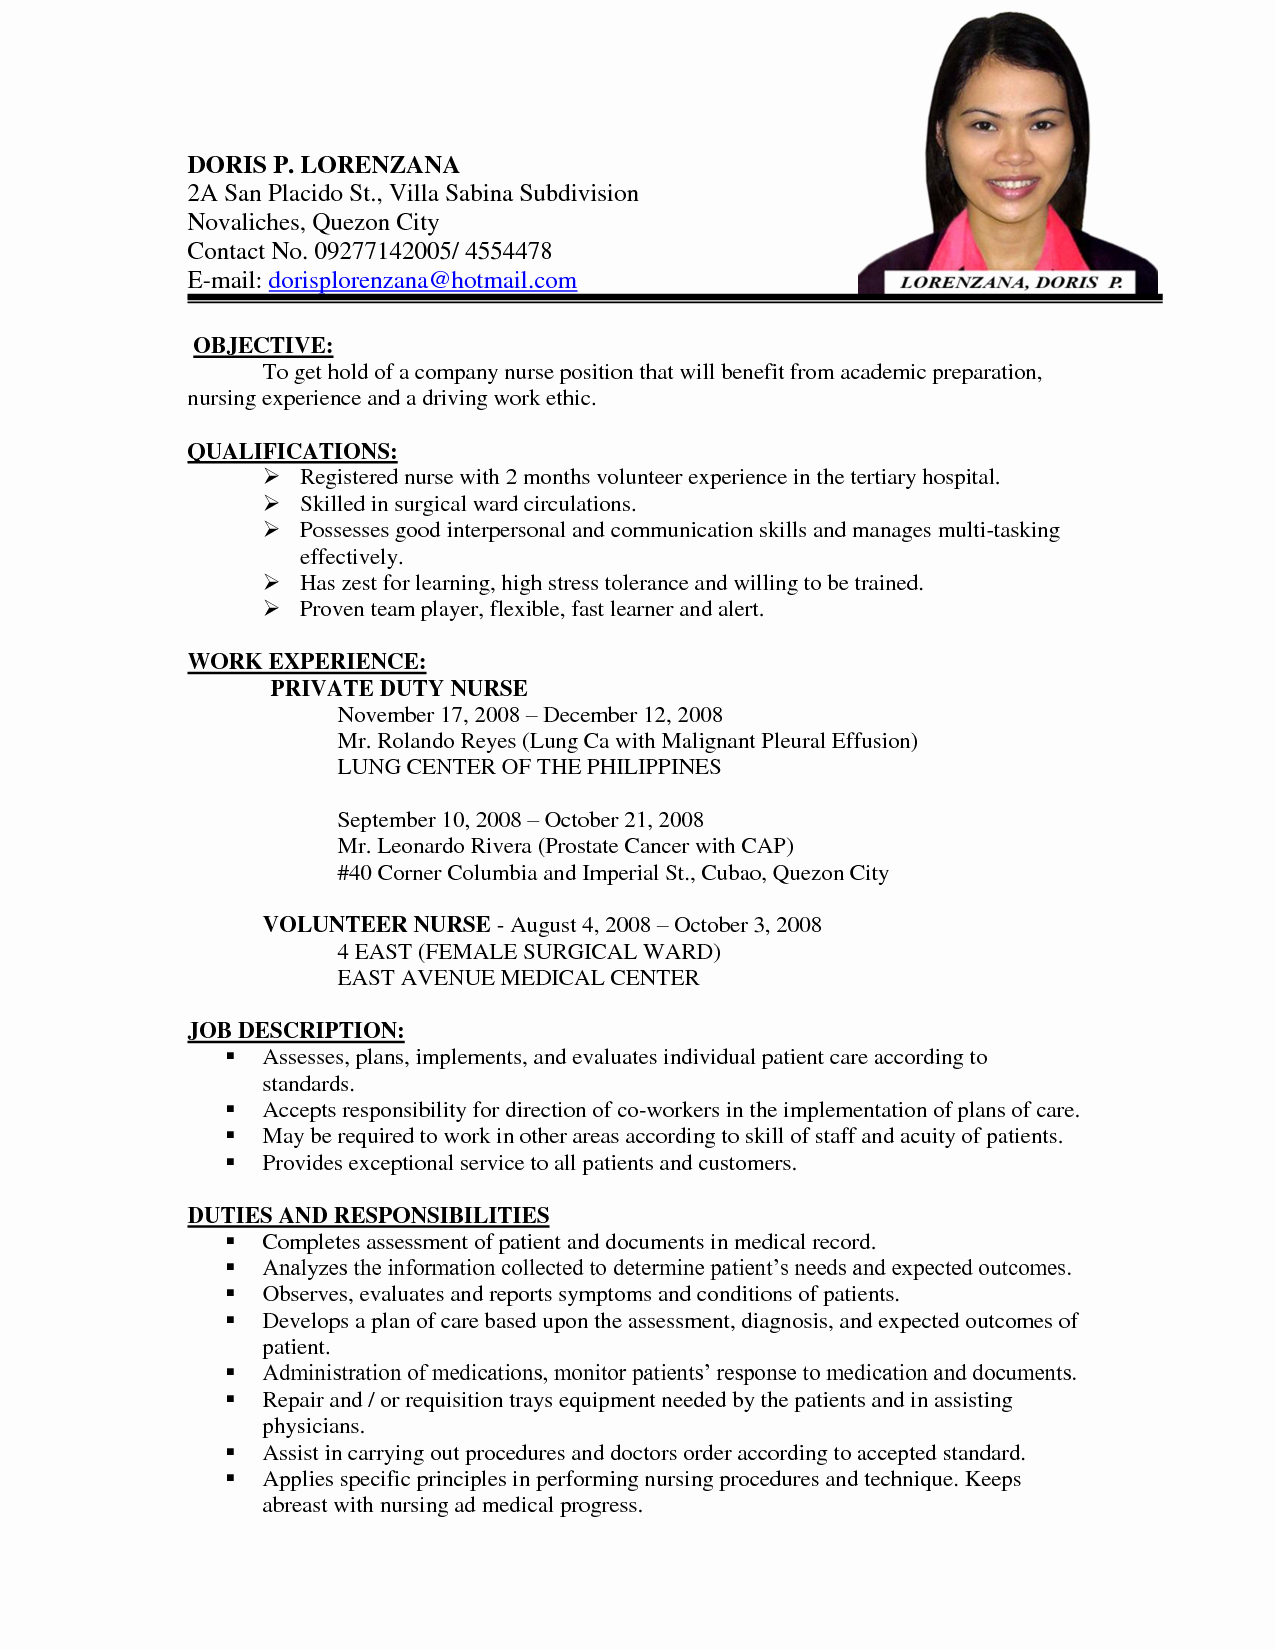 Sample Of Curriculum Vita Lovely Nursing Curriculum Vitae Examples Google Search